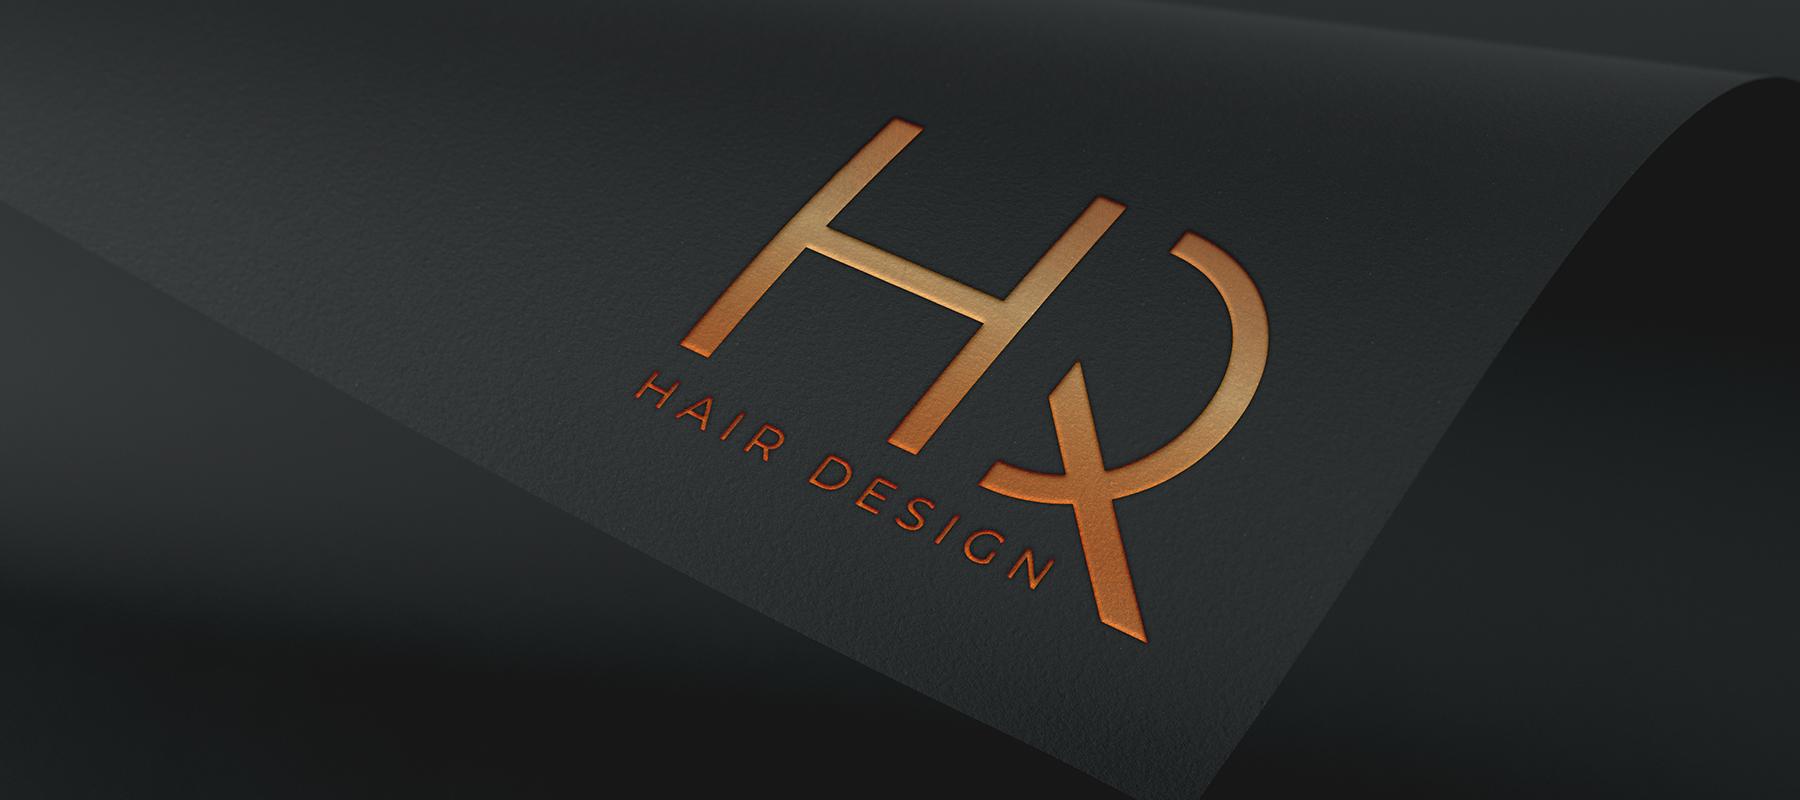 HQ Hair Design, Logo, Brand Identity, Sudbury, Suffolk - Indigo Ross